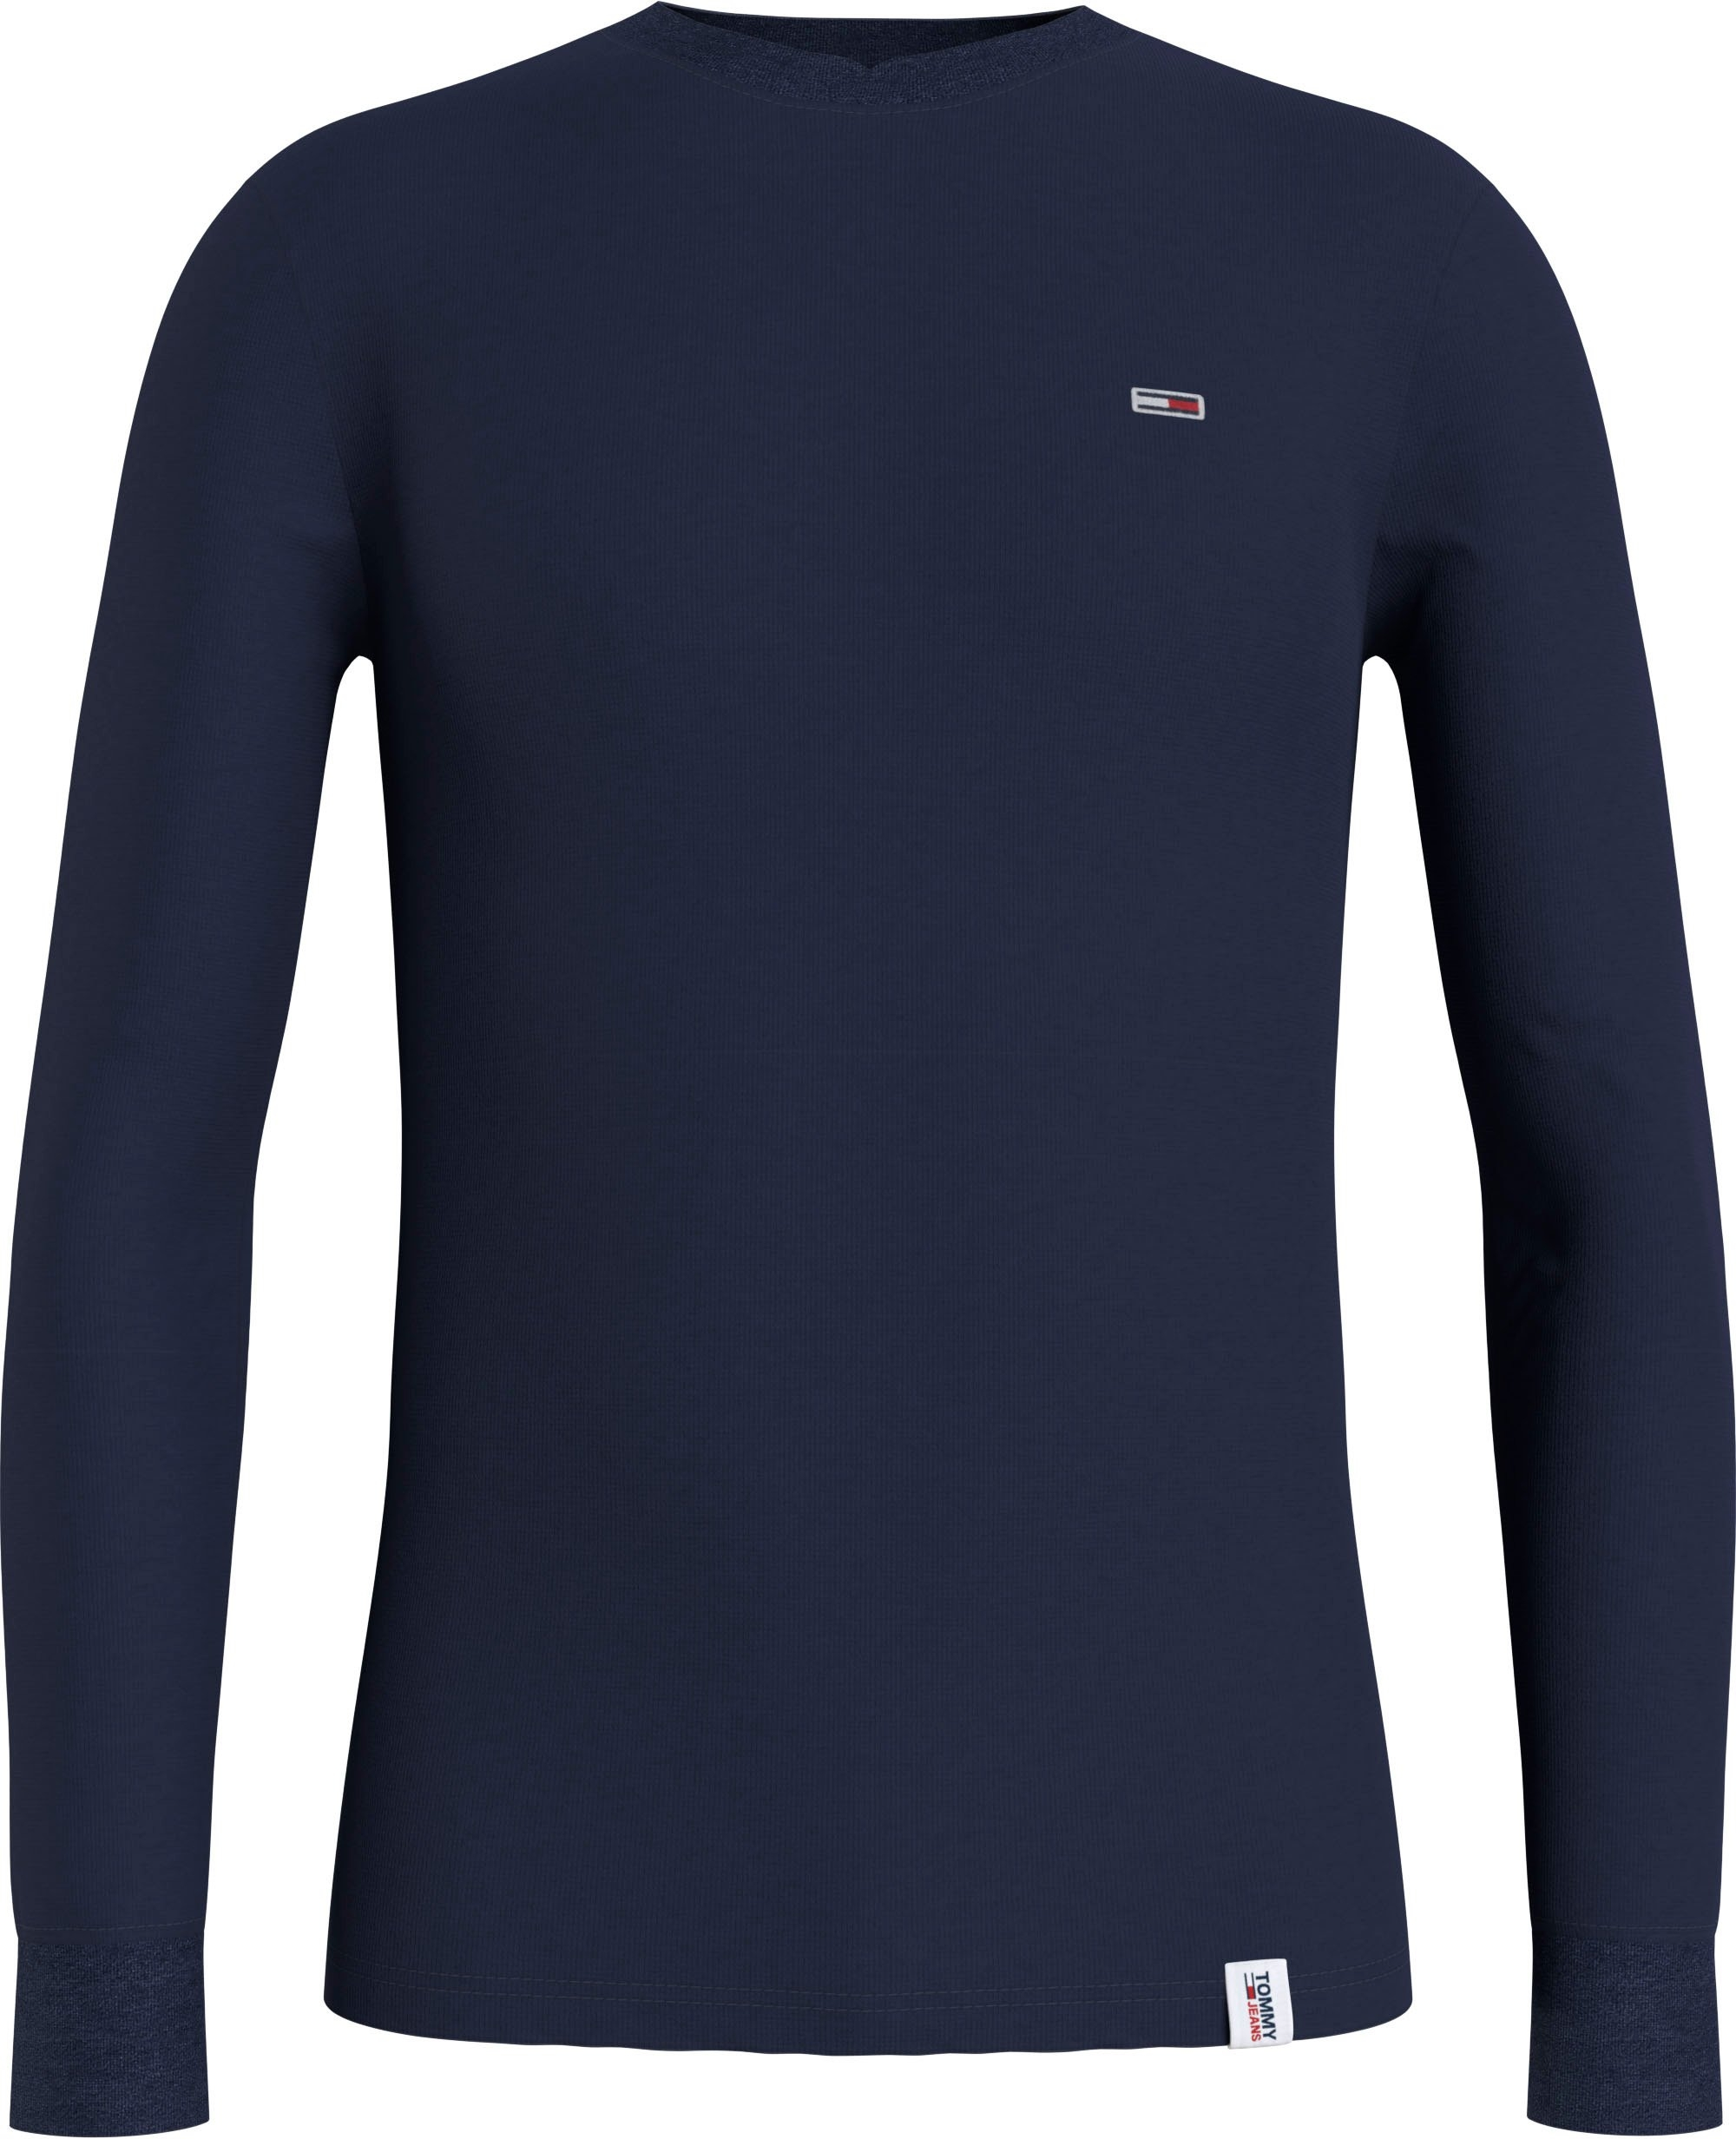 TOMMY JEANS shirt met lange mouwen TJM MINI WAFFLE JASPE LONGSLEEVE voordelig en veilig online kopen